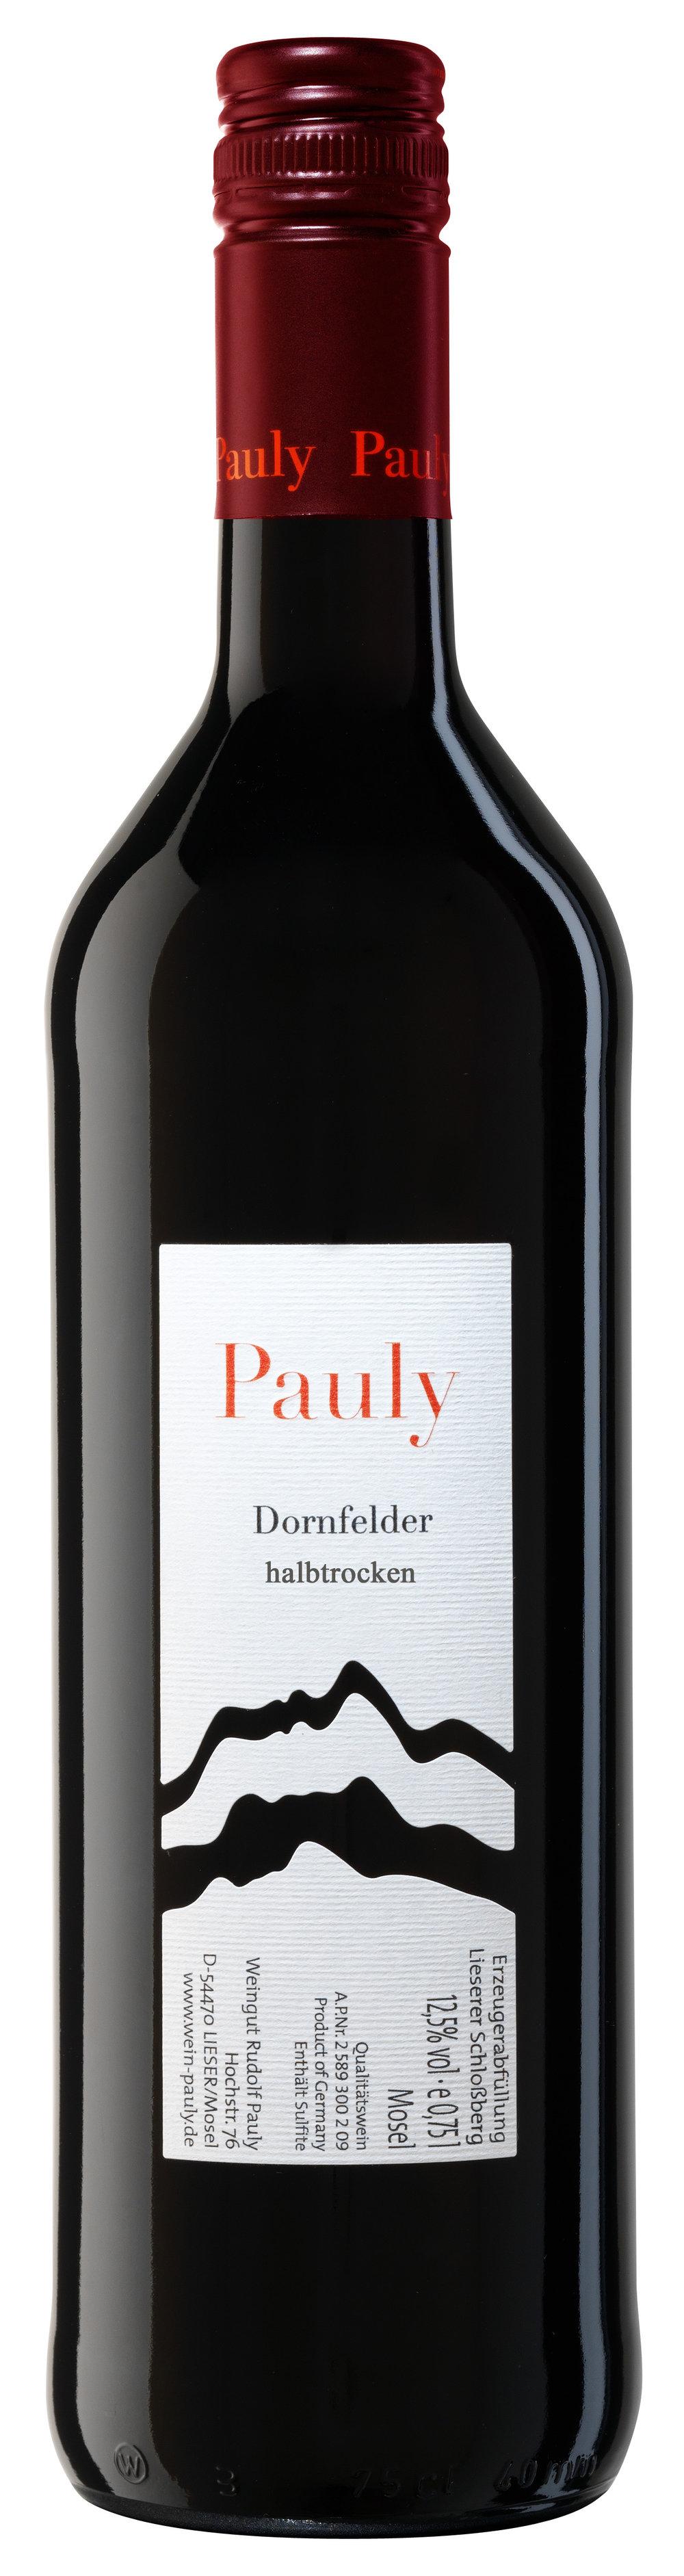 PaulyDornfelder_halbtrocken.jpg